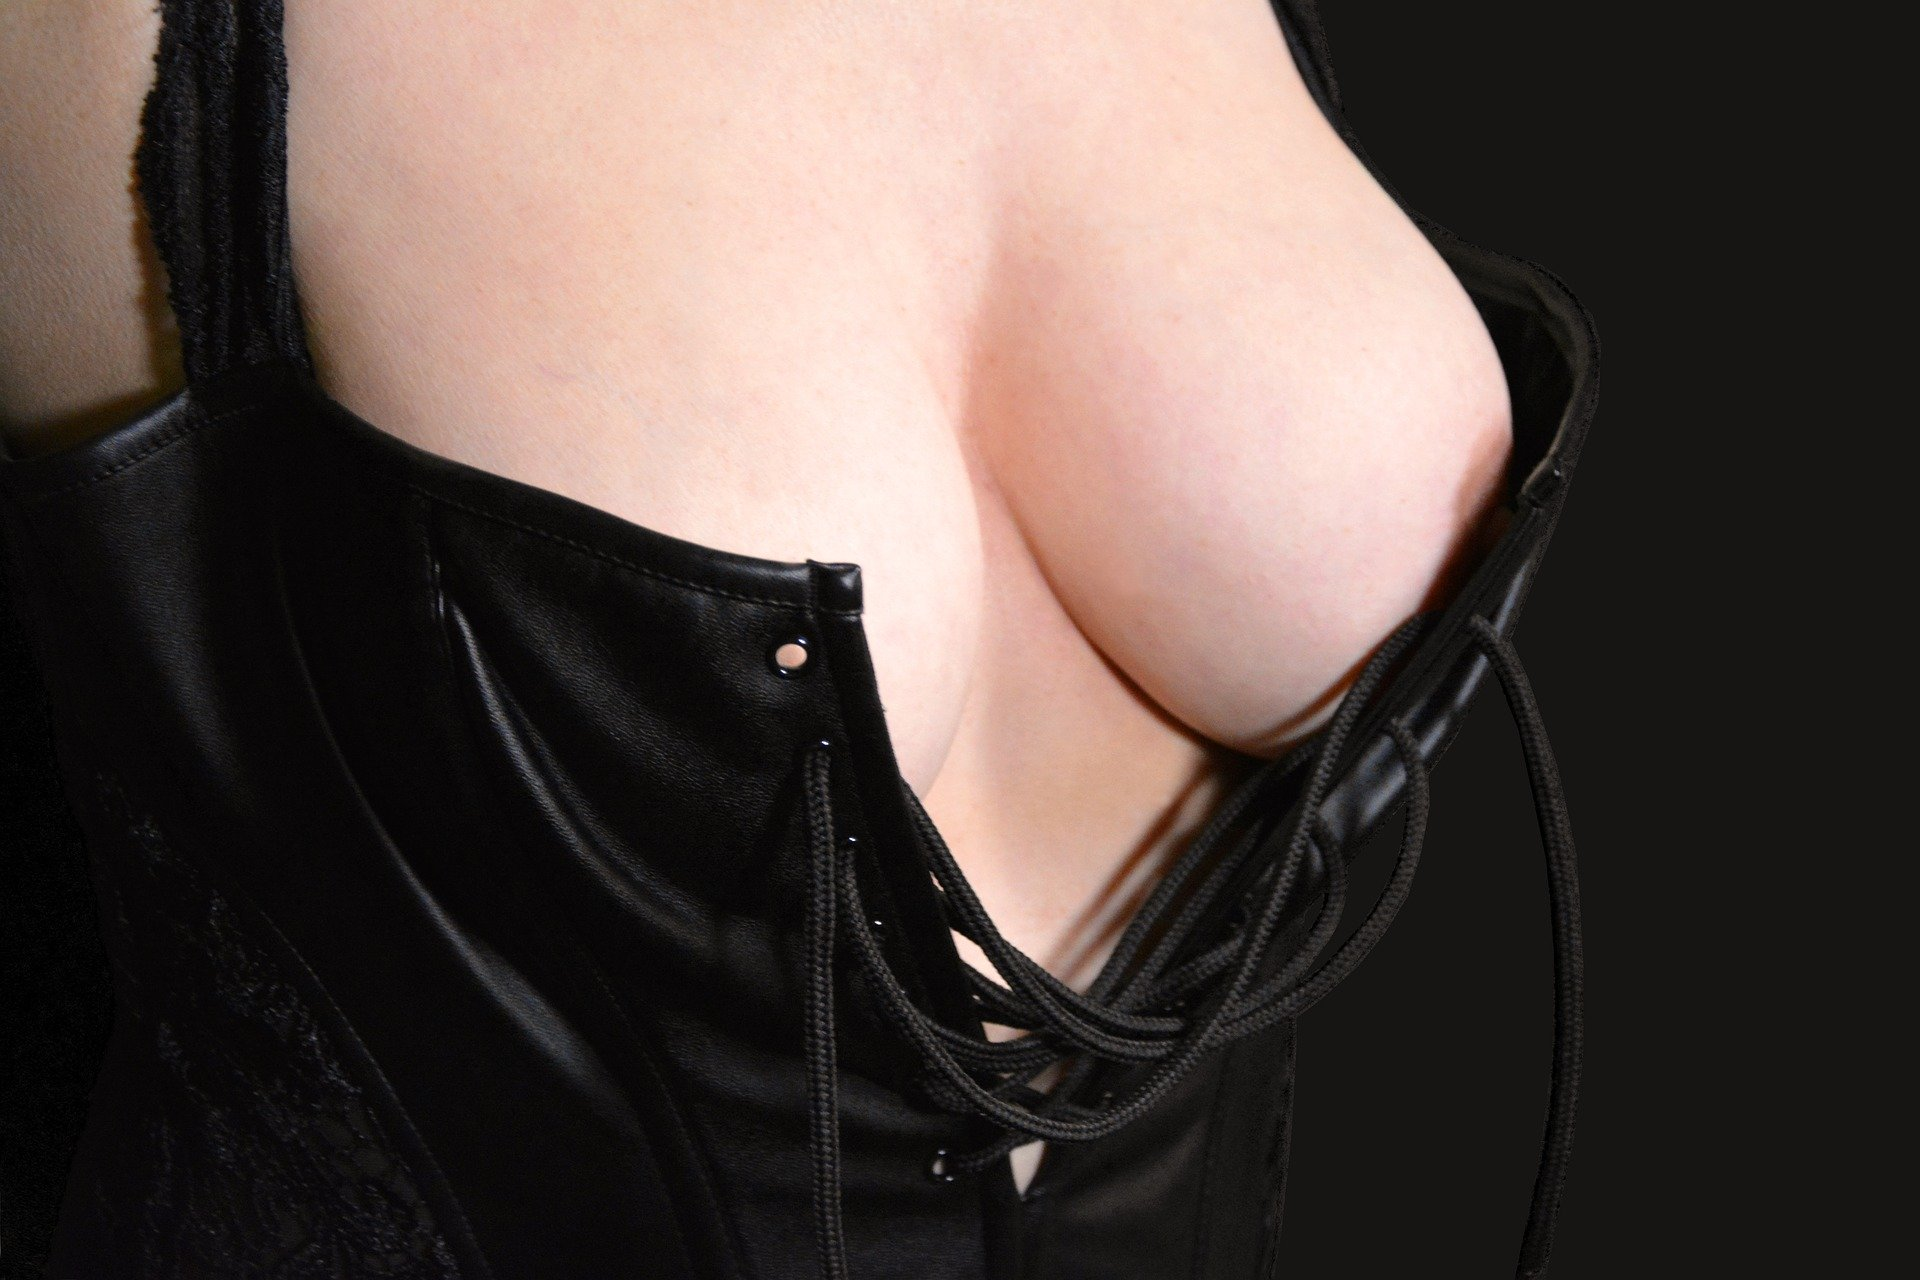 breasts 2293508 1920 - エロ動画、ただで見れるサイト大公開